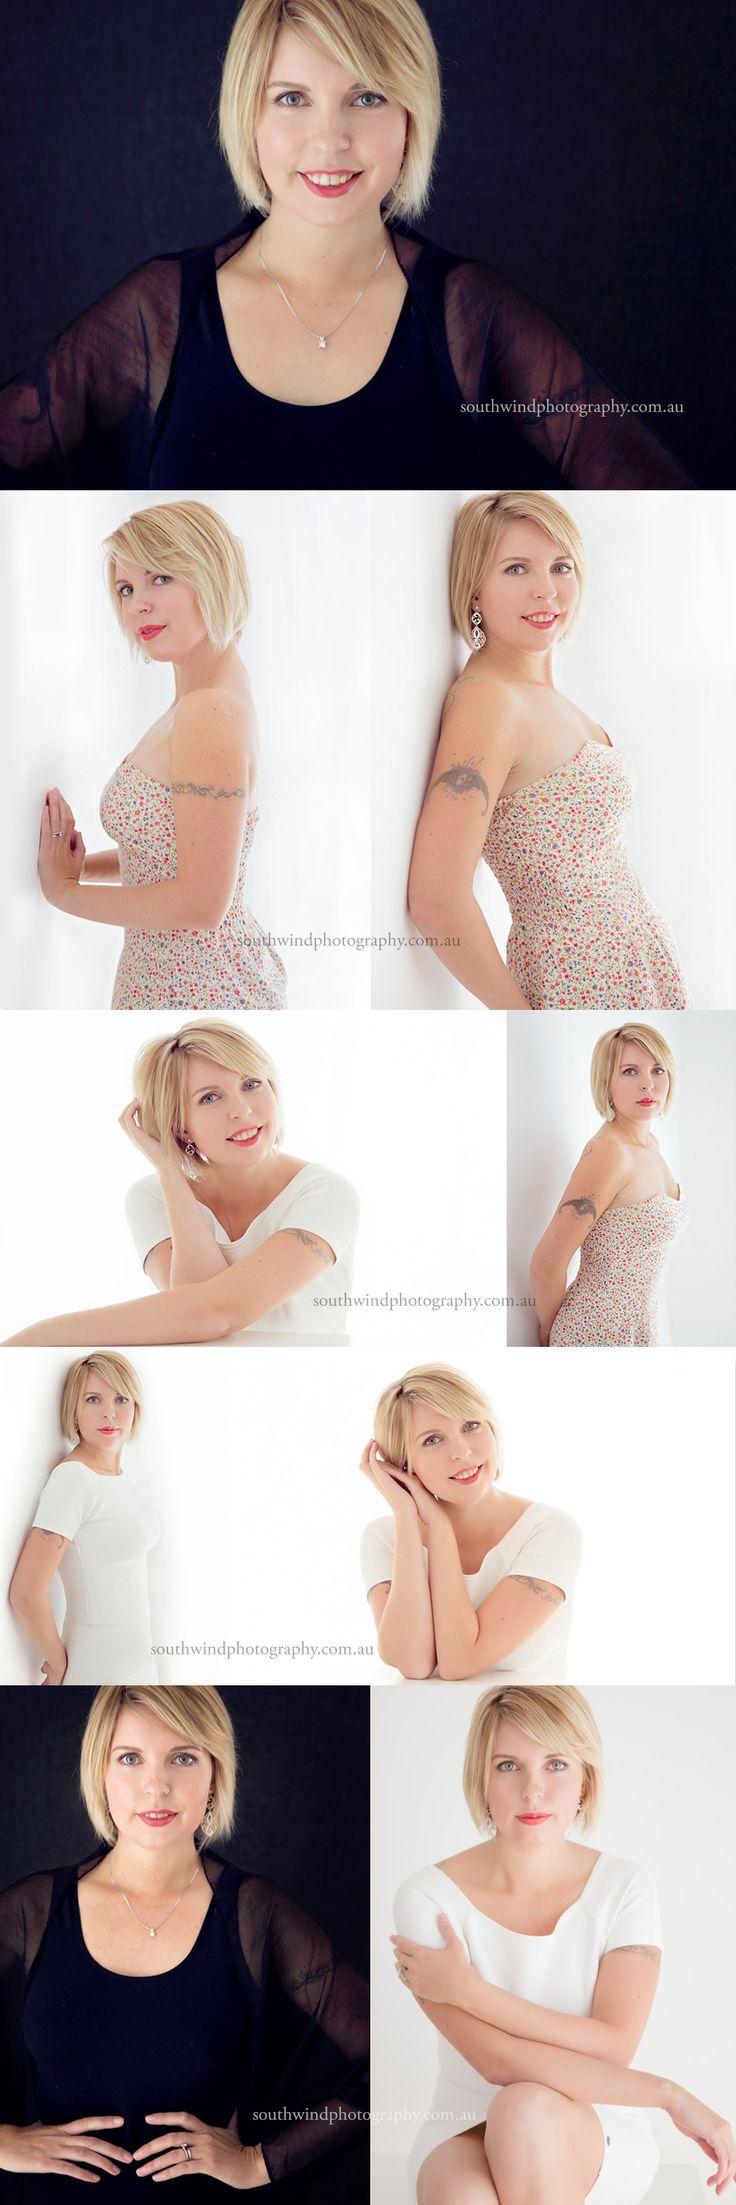 Beautiful woman and friend. Simple #studio portraits. #naturallight #sydney #southwindphotography #family #familyphotography #centralcoast #lady #summer #summerportrait